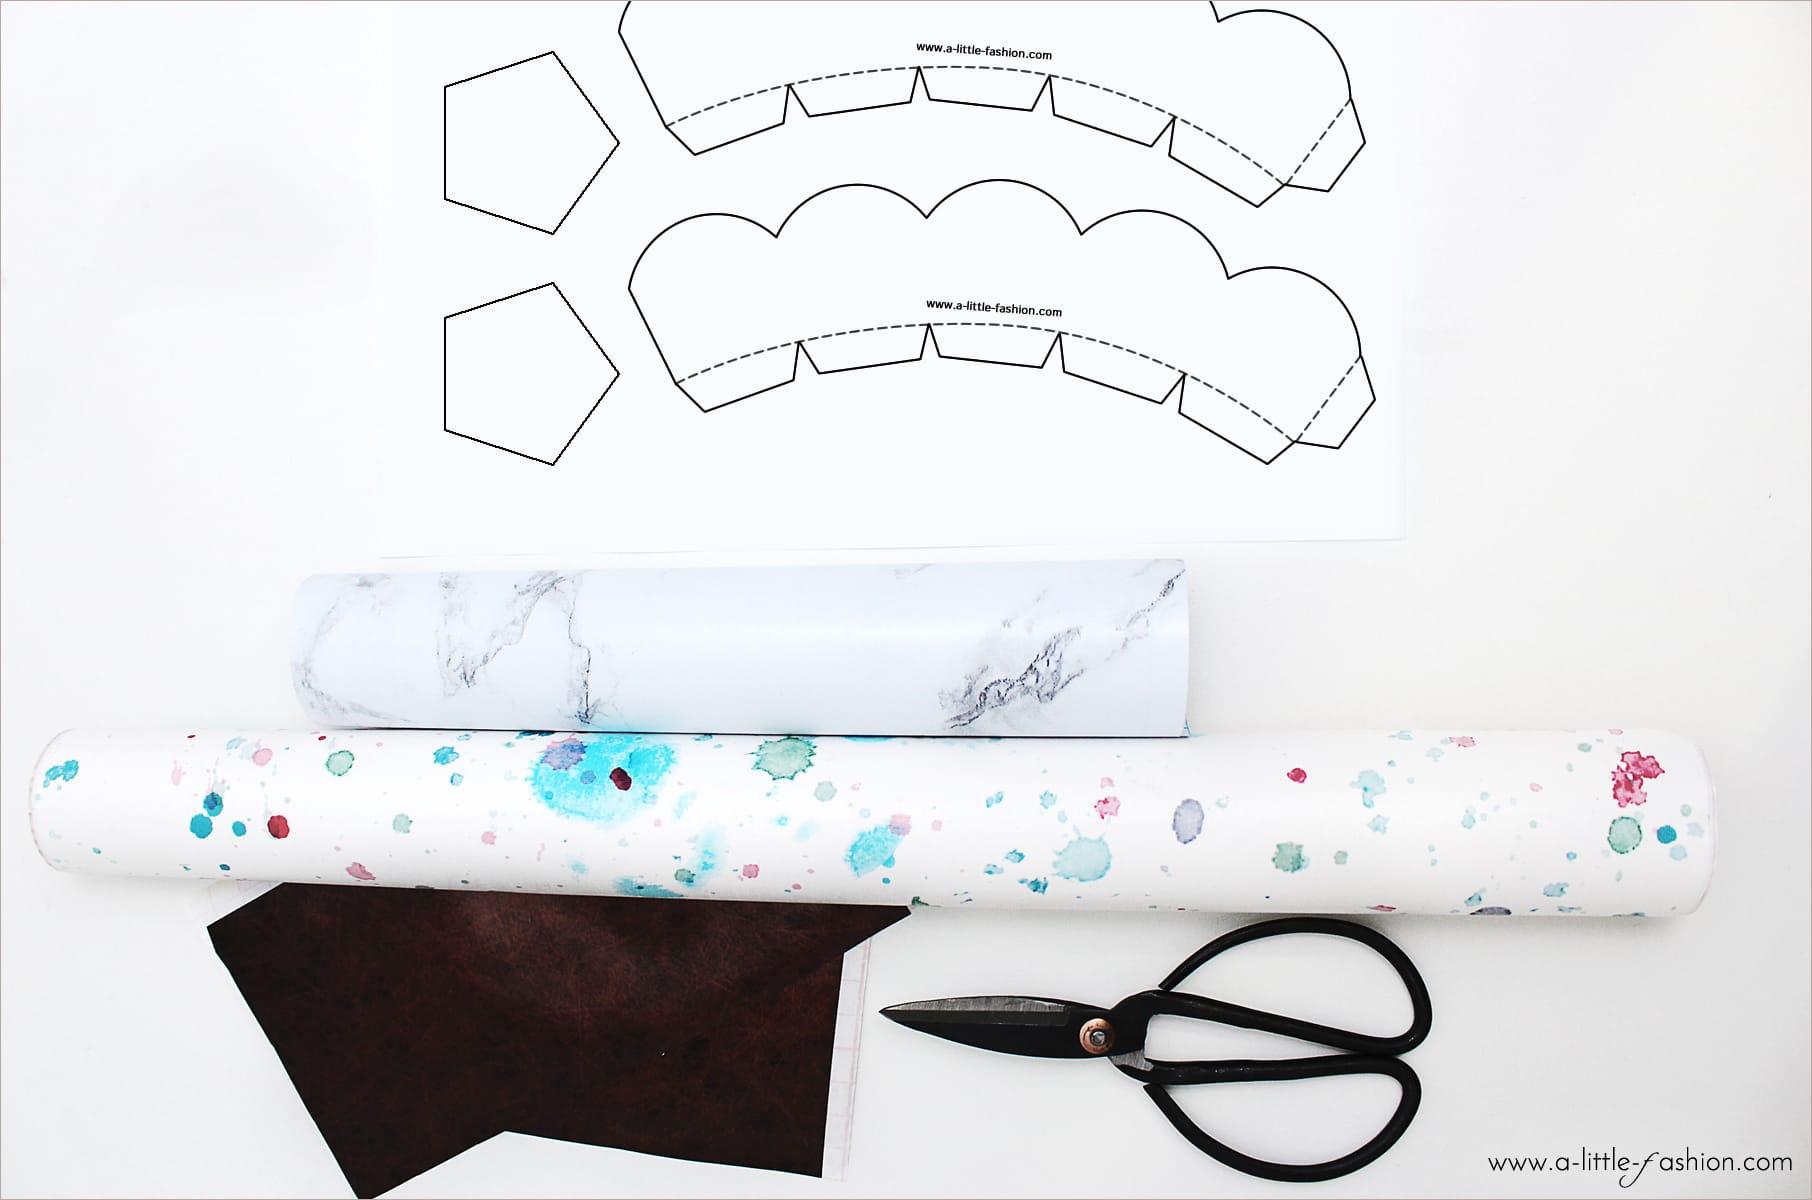 muffin f rmchen in wunschdesign selber machen. Black Bedroom Furniture Sets. Home Design Ideas